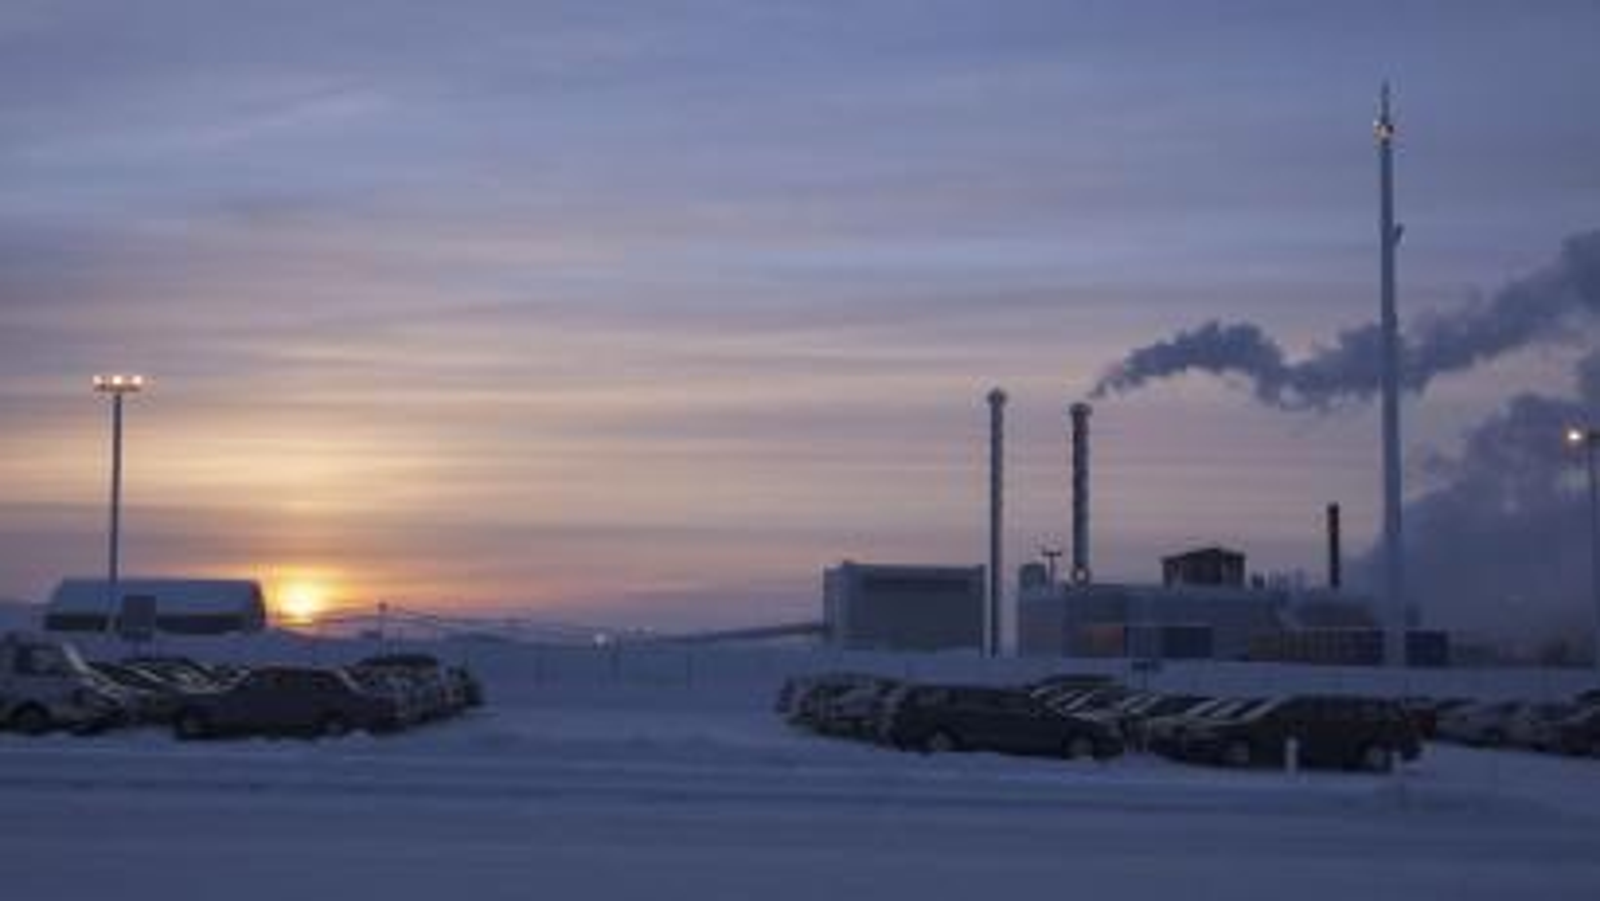 A nickel mine in Finland.